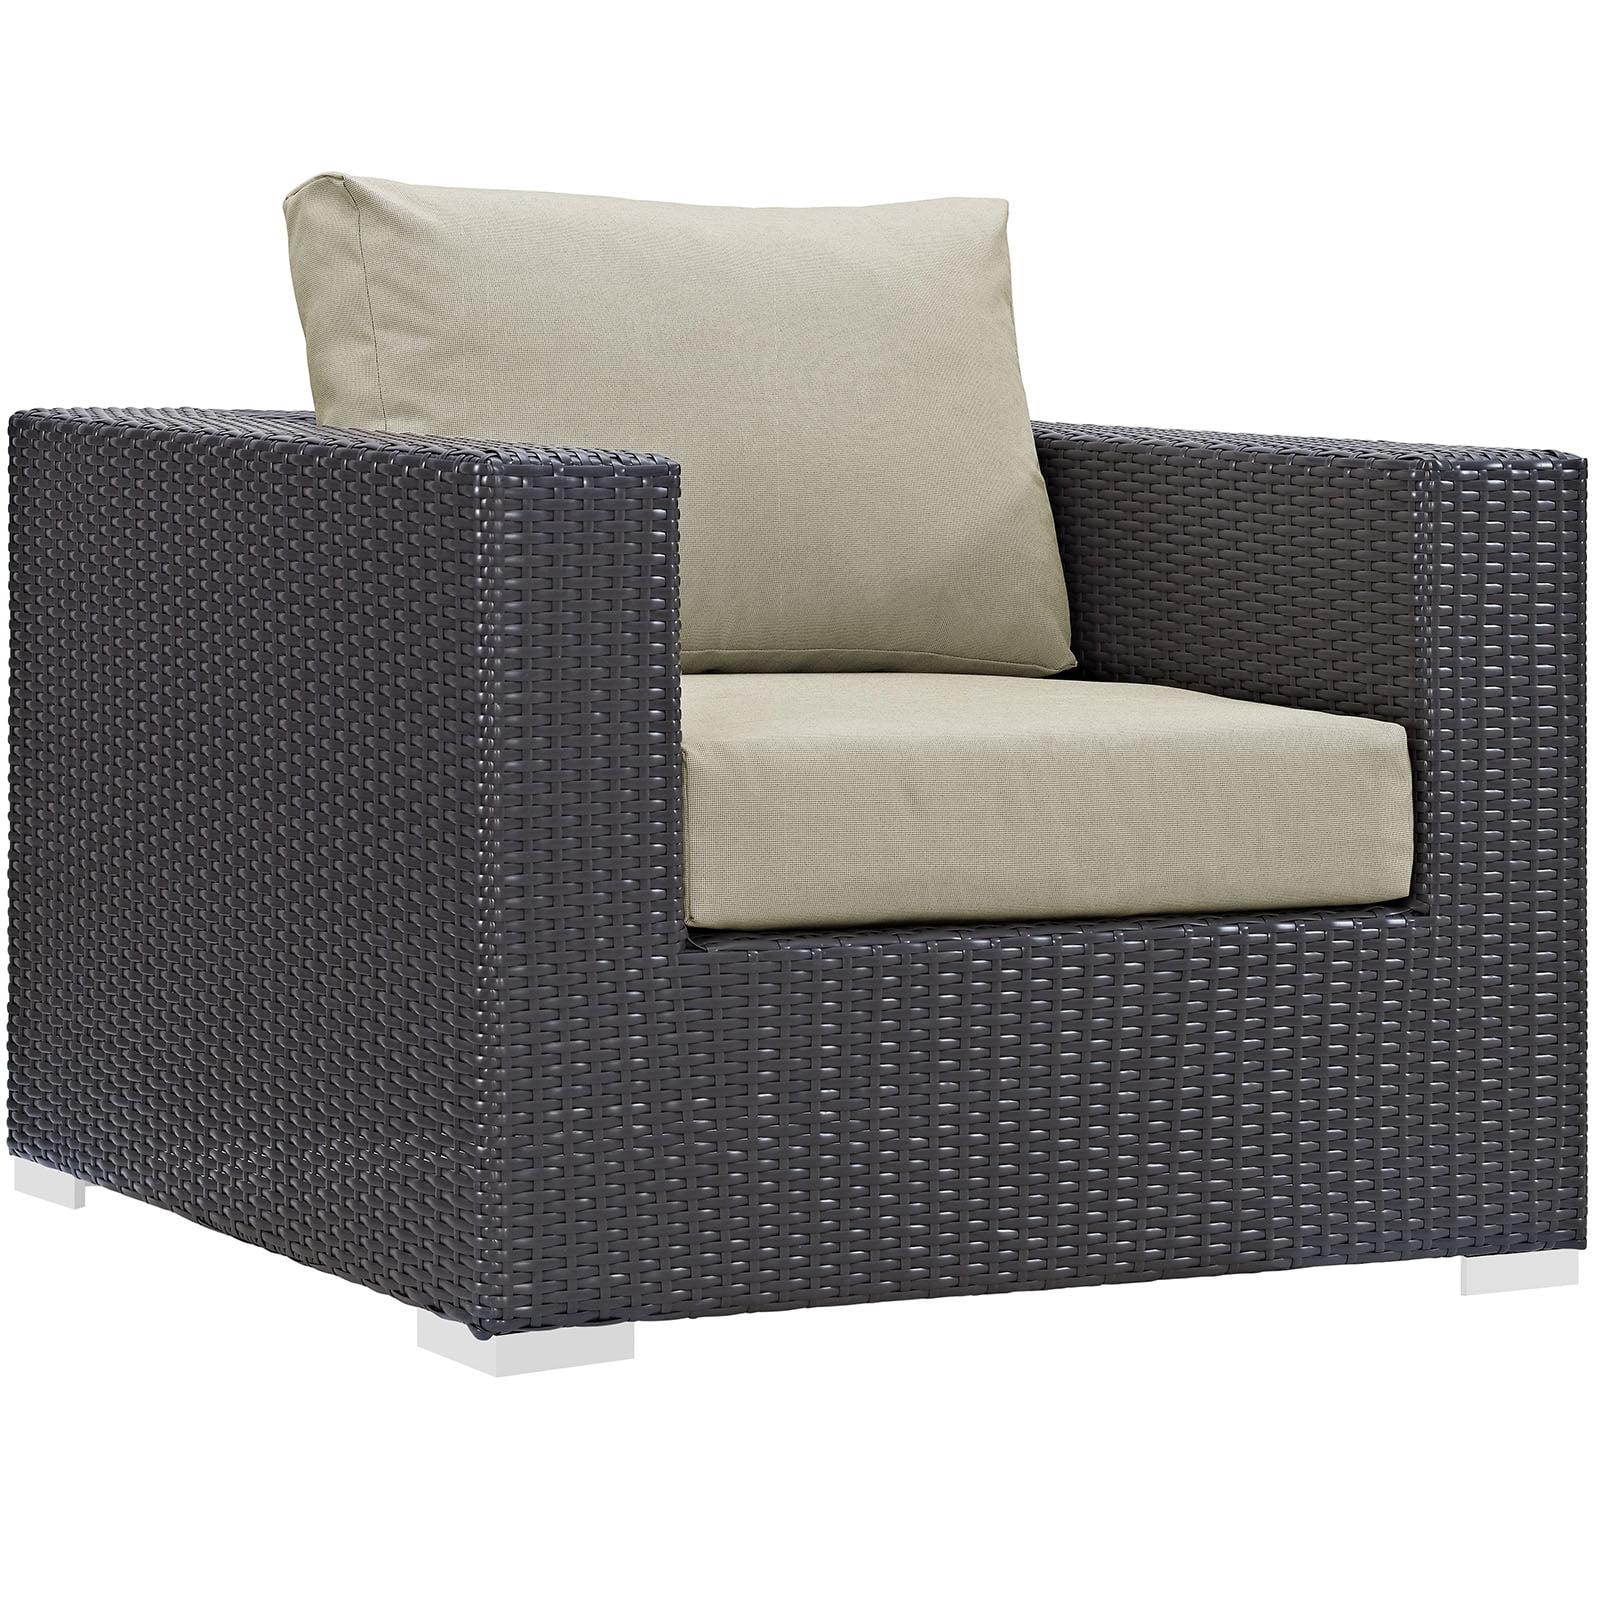 Modern Contemporary Urban Design Outdoor Patio Balcony Lounge Chair, Beige, Rattan